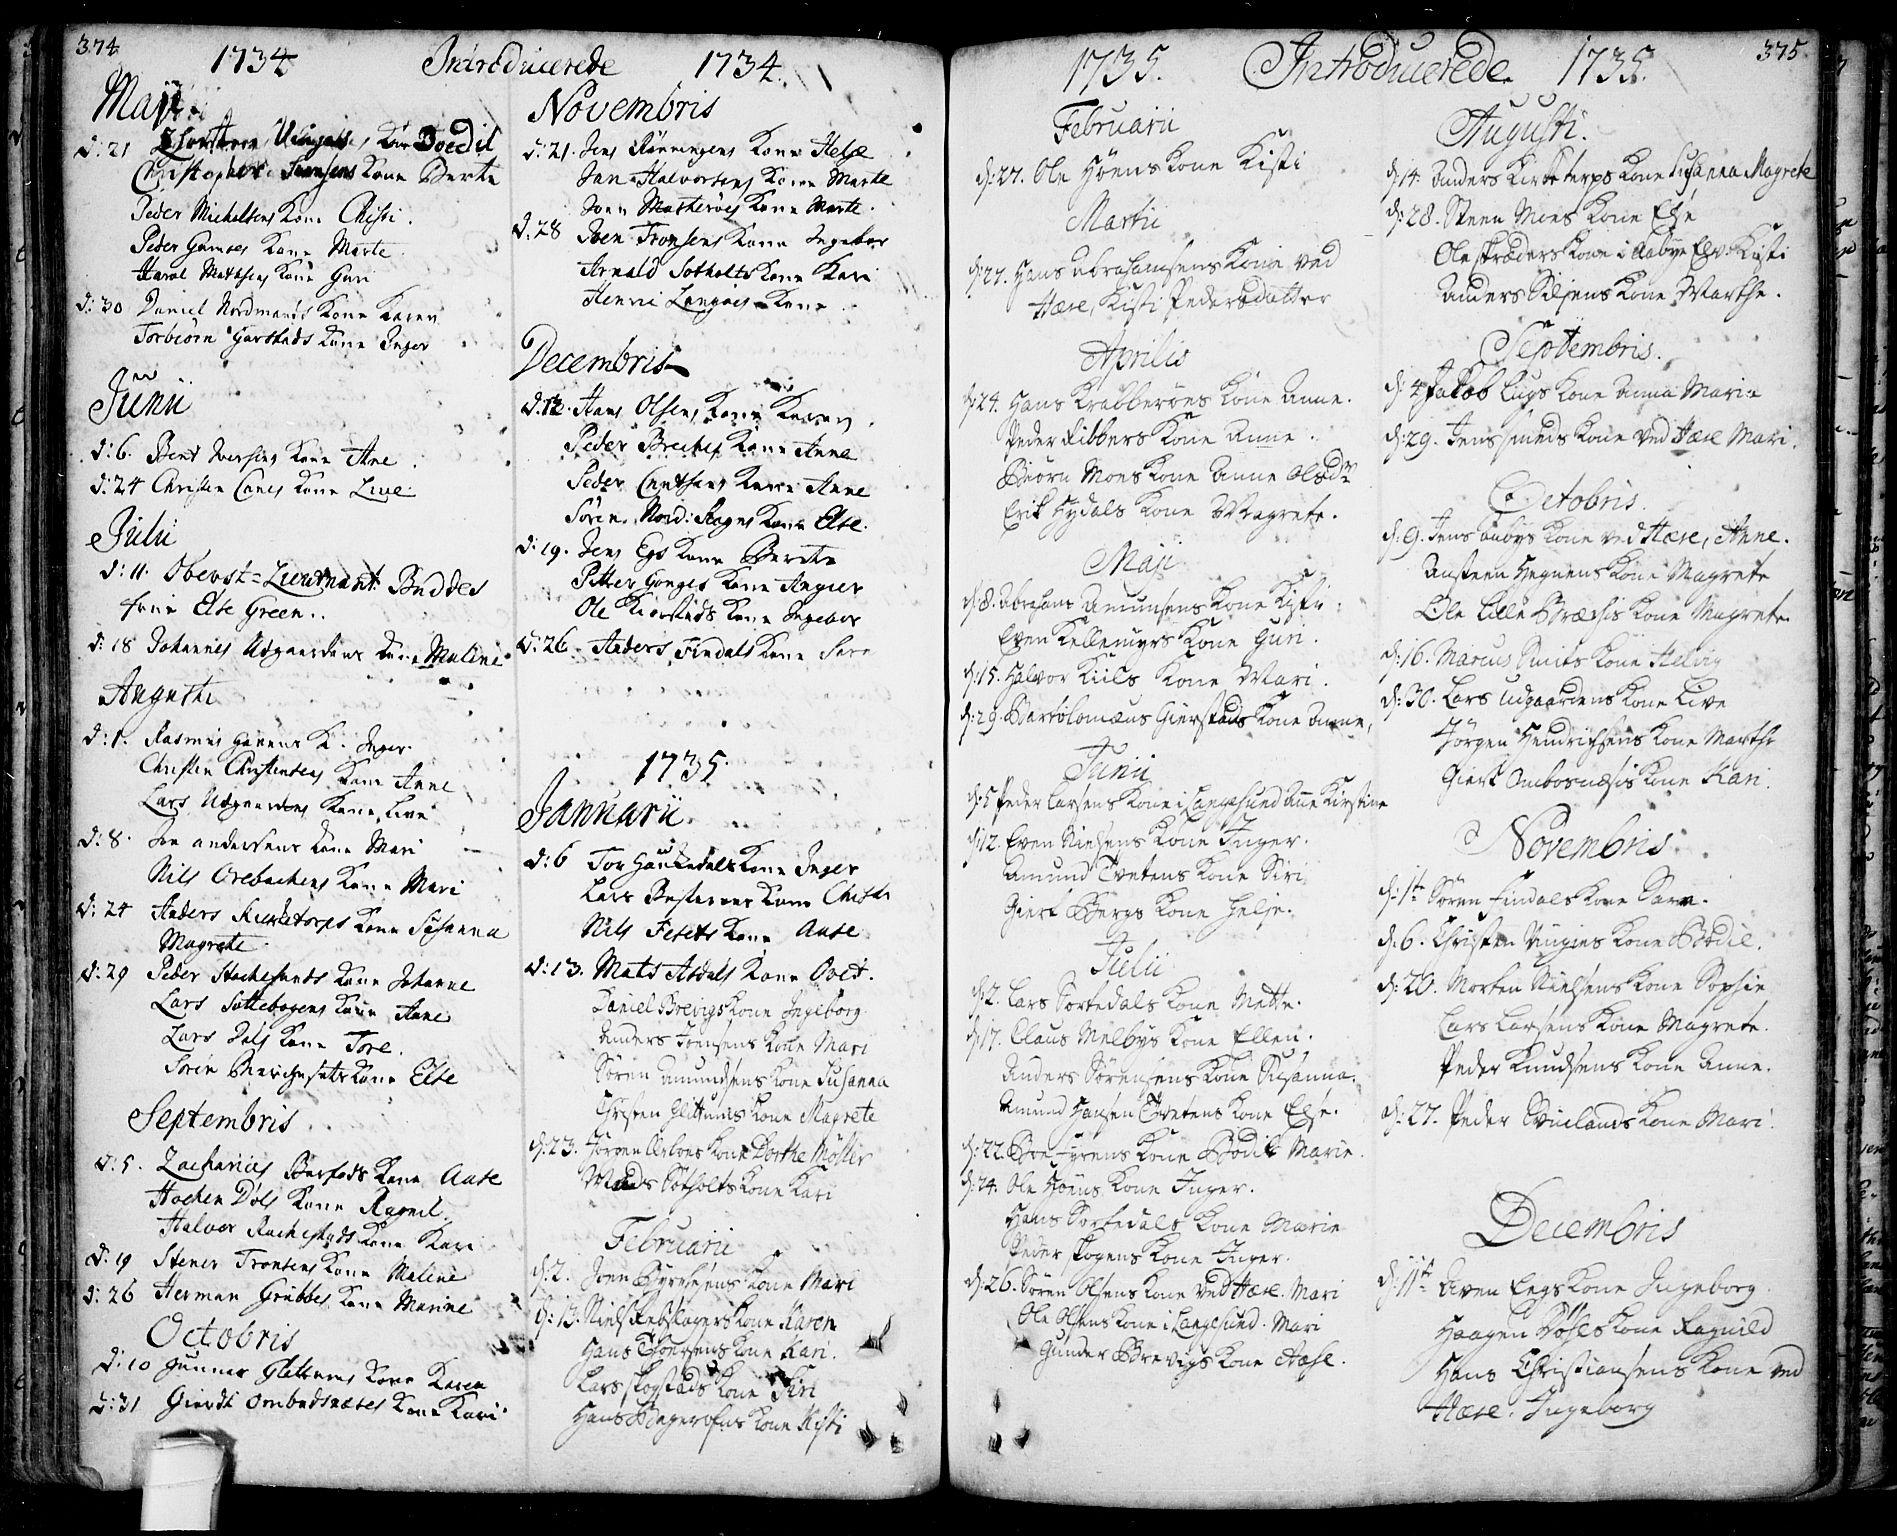 SAKO, Bamble kirkebøker, F/Fa/L0001: Ministerialbok nr. I 1, 1702-1774, s. 374-375